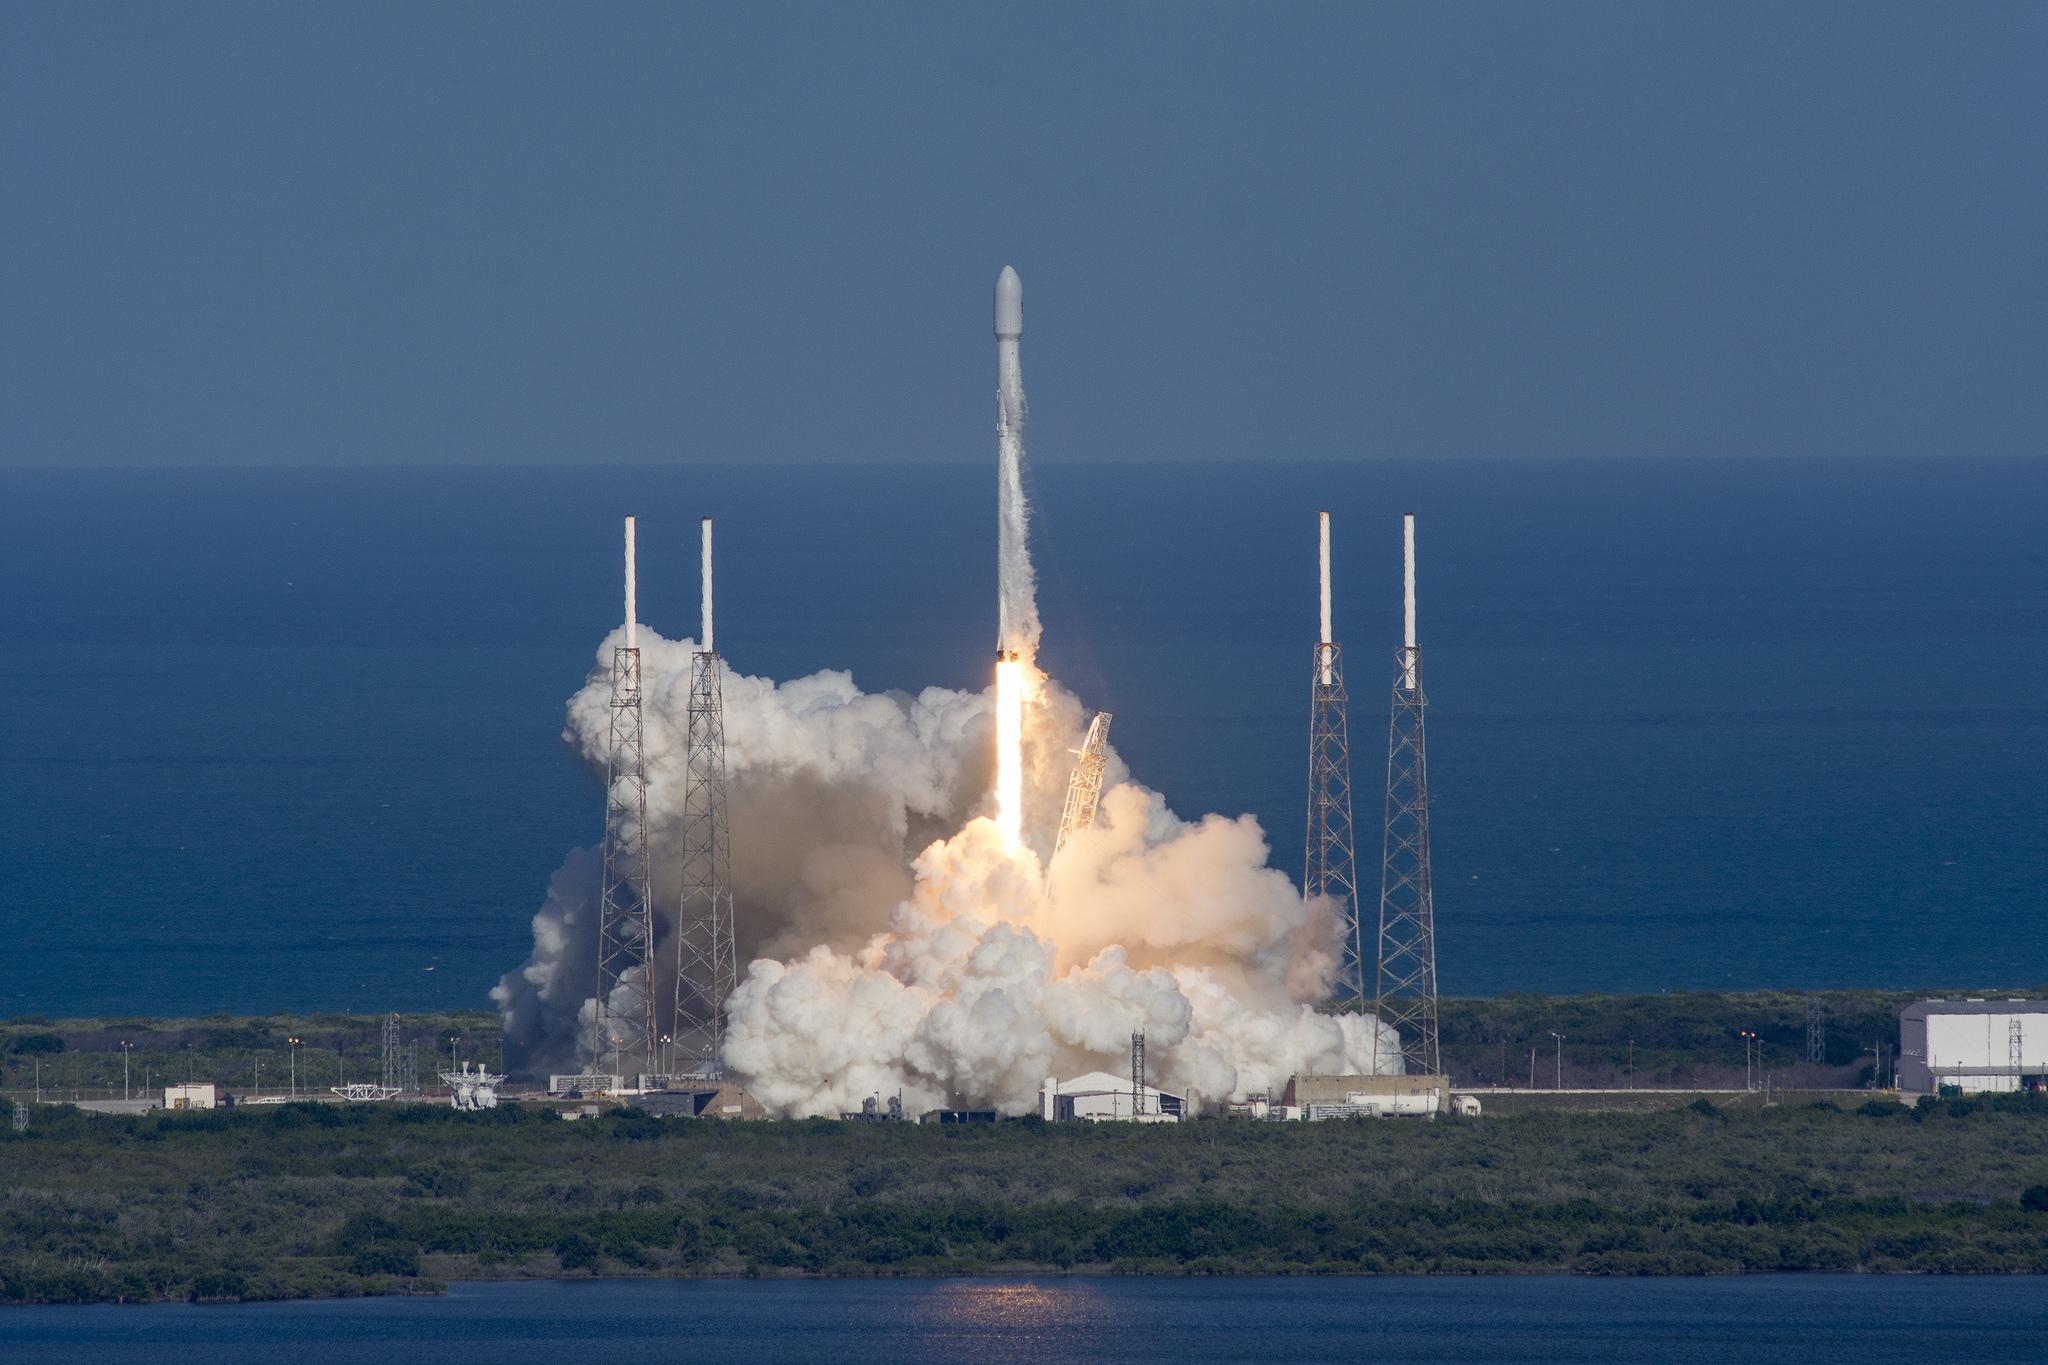 Falcon 9 launches THAICOM 8 | Credit: SpaceX